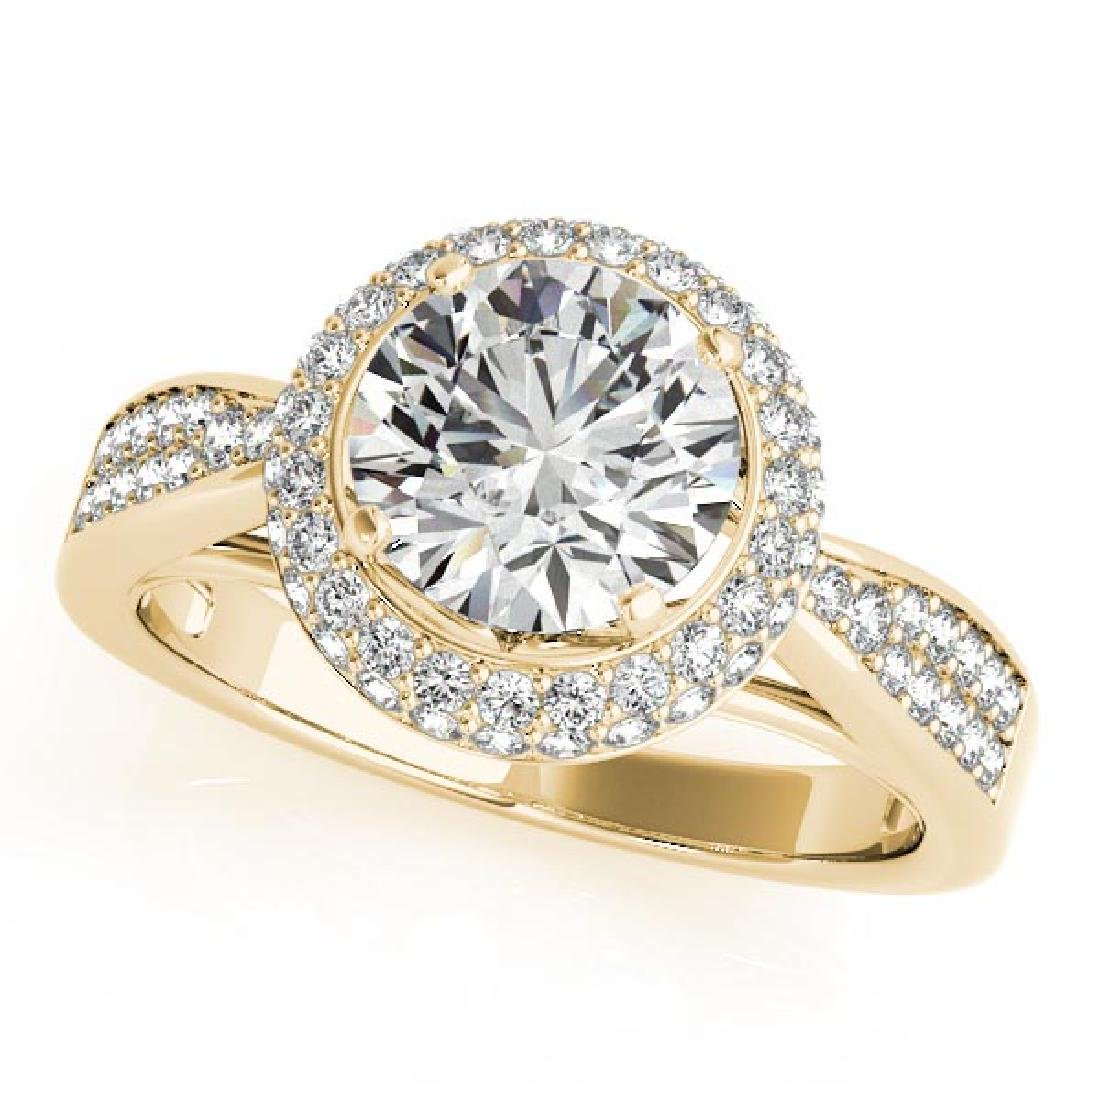 CERTIFIED 18K YELLOW GOLD 0.86 CT G-H/VS-SI1 DIAMOND HA